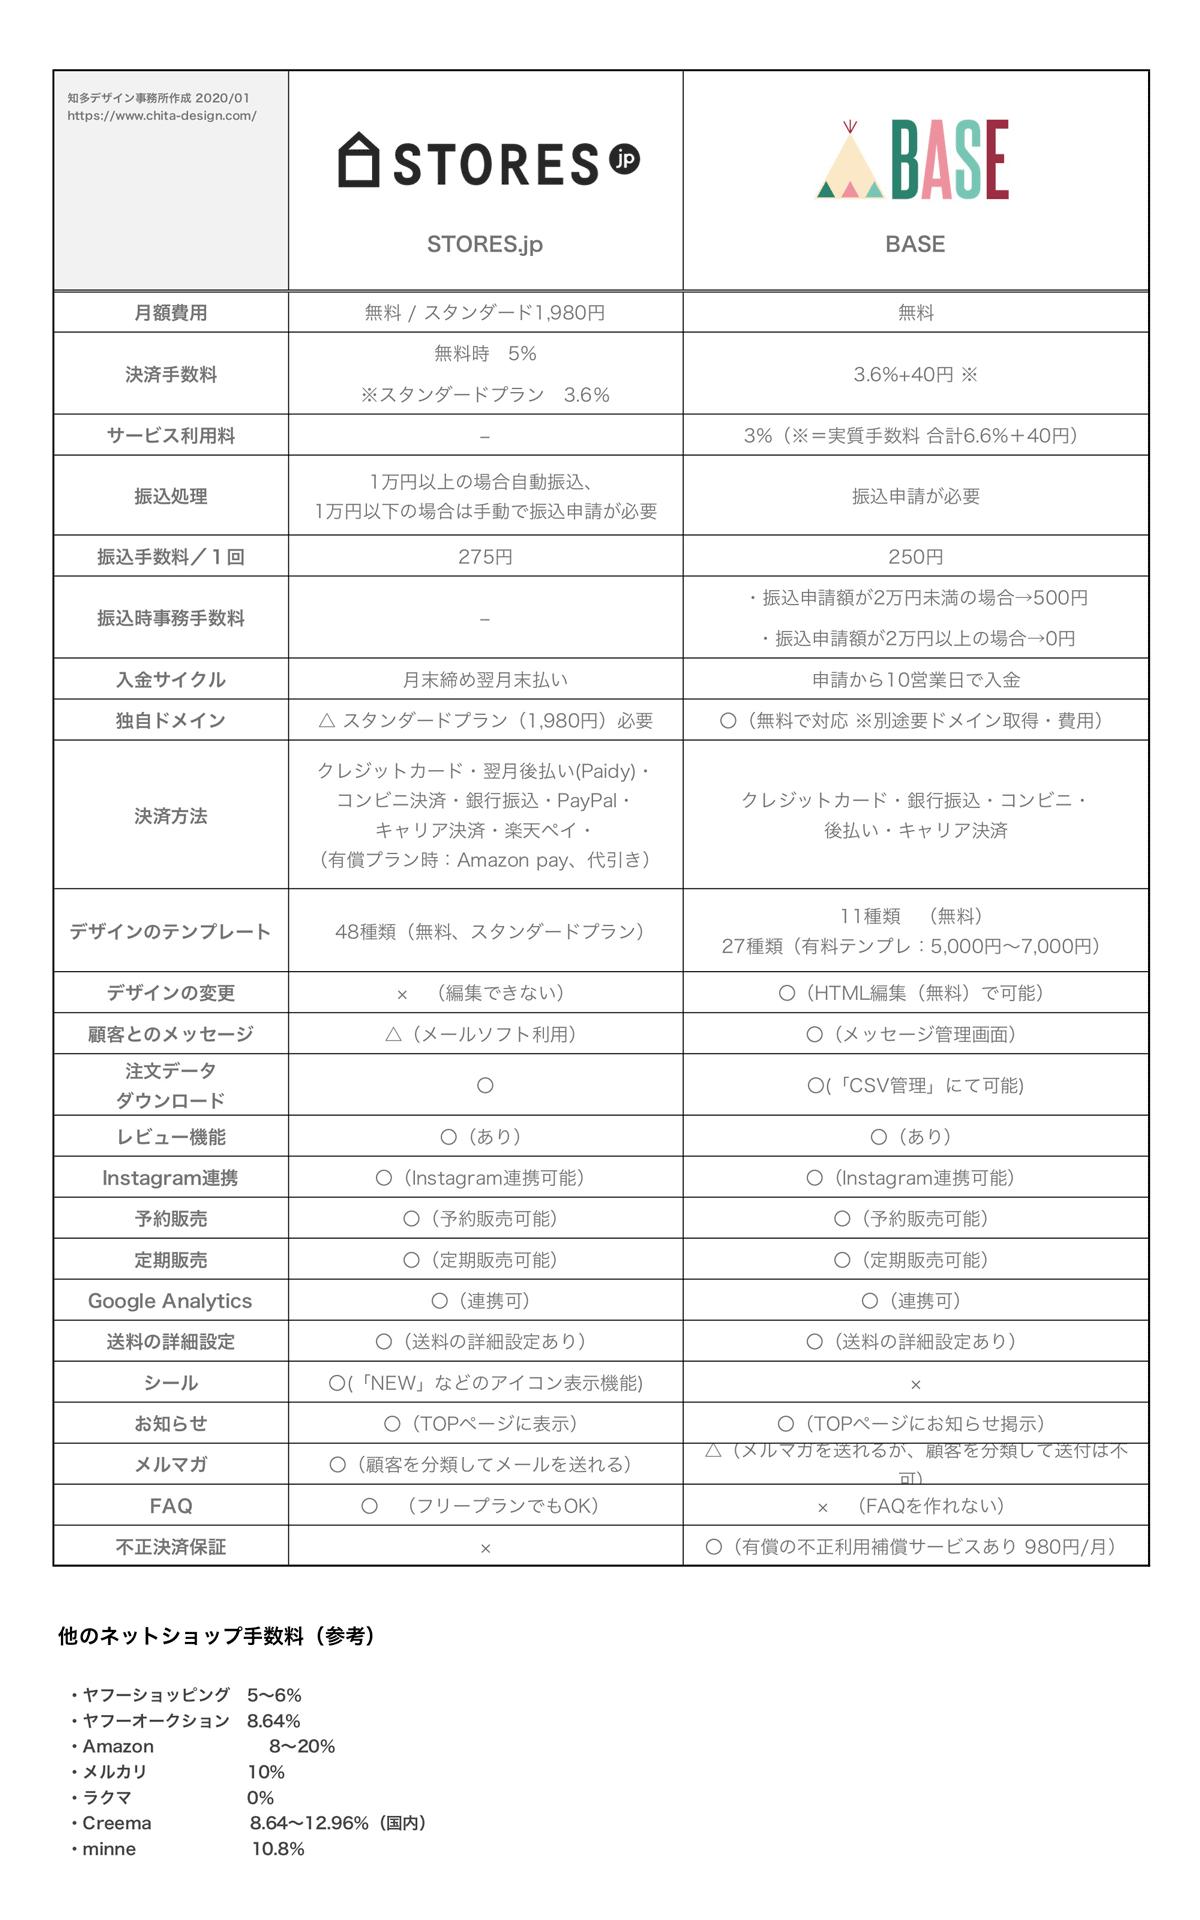 STORES-jpとBASEの機能一覧比較表(2020年01月)